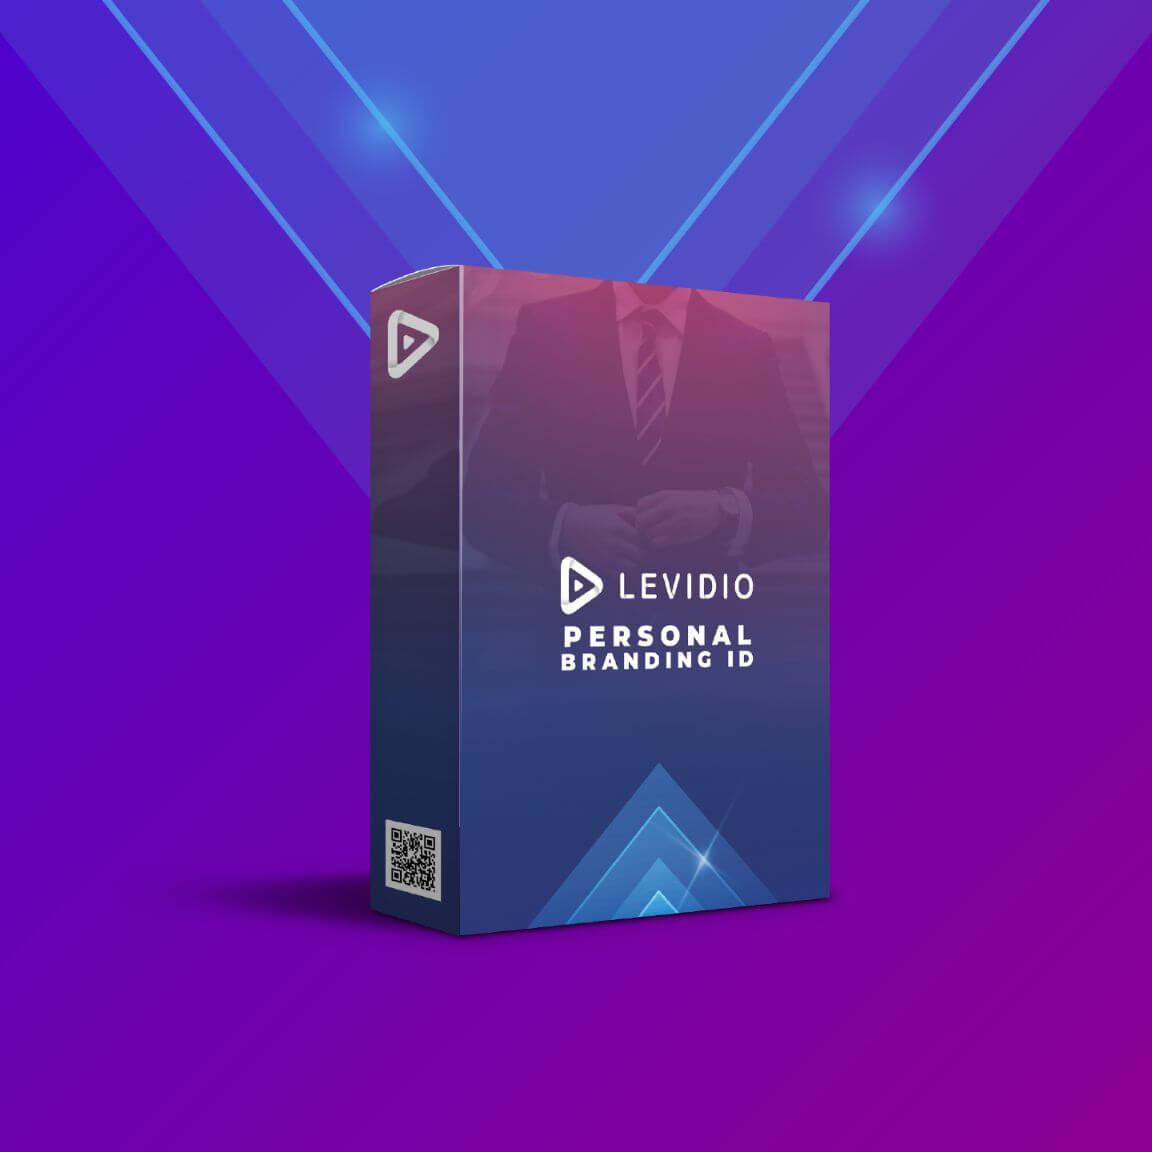 Levidio-Personal-Branding.jpeg